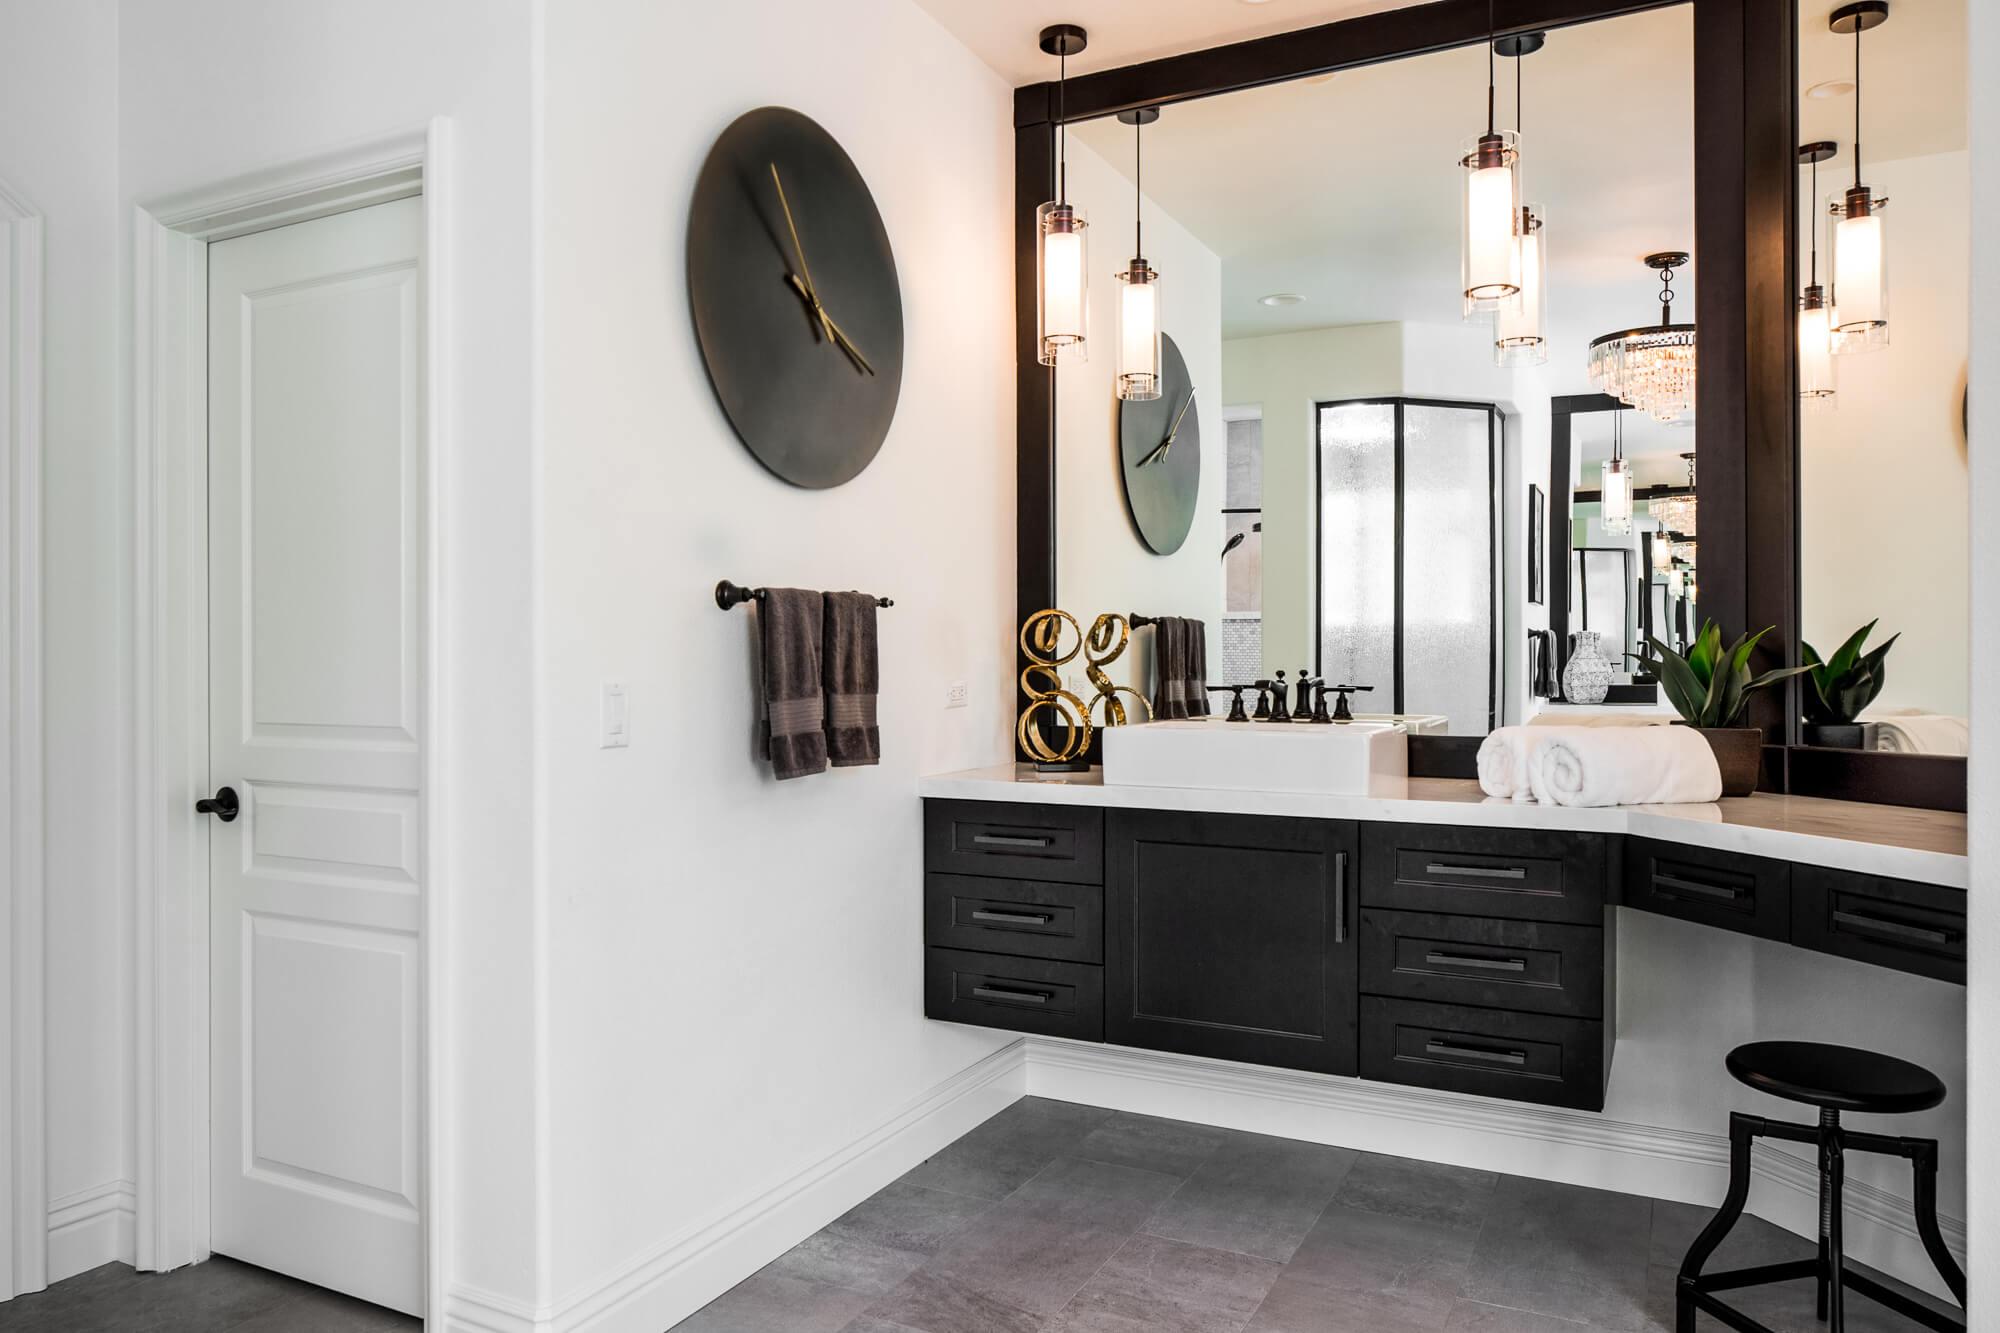 Floating Vanity in Master Bathroom, Master Bathroom Design, Orange County Custom Home Remodeling